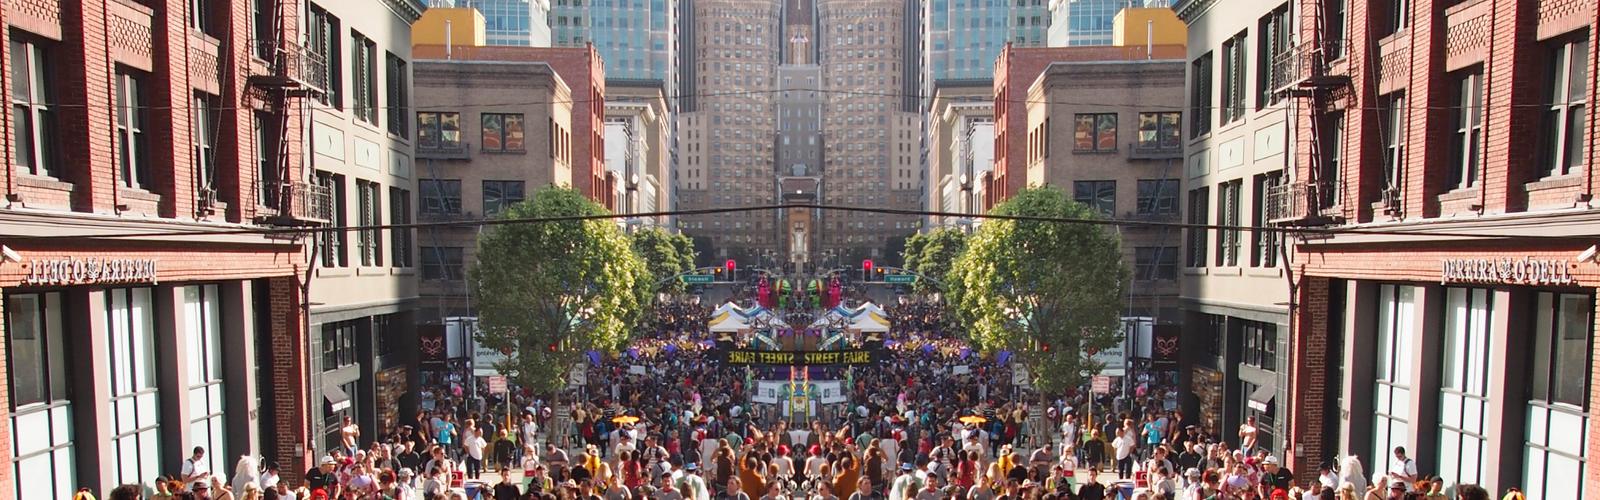 How Weird Street Fair: experience the fun, feel the music and be weird!